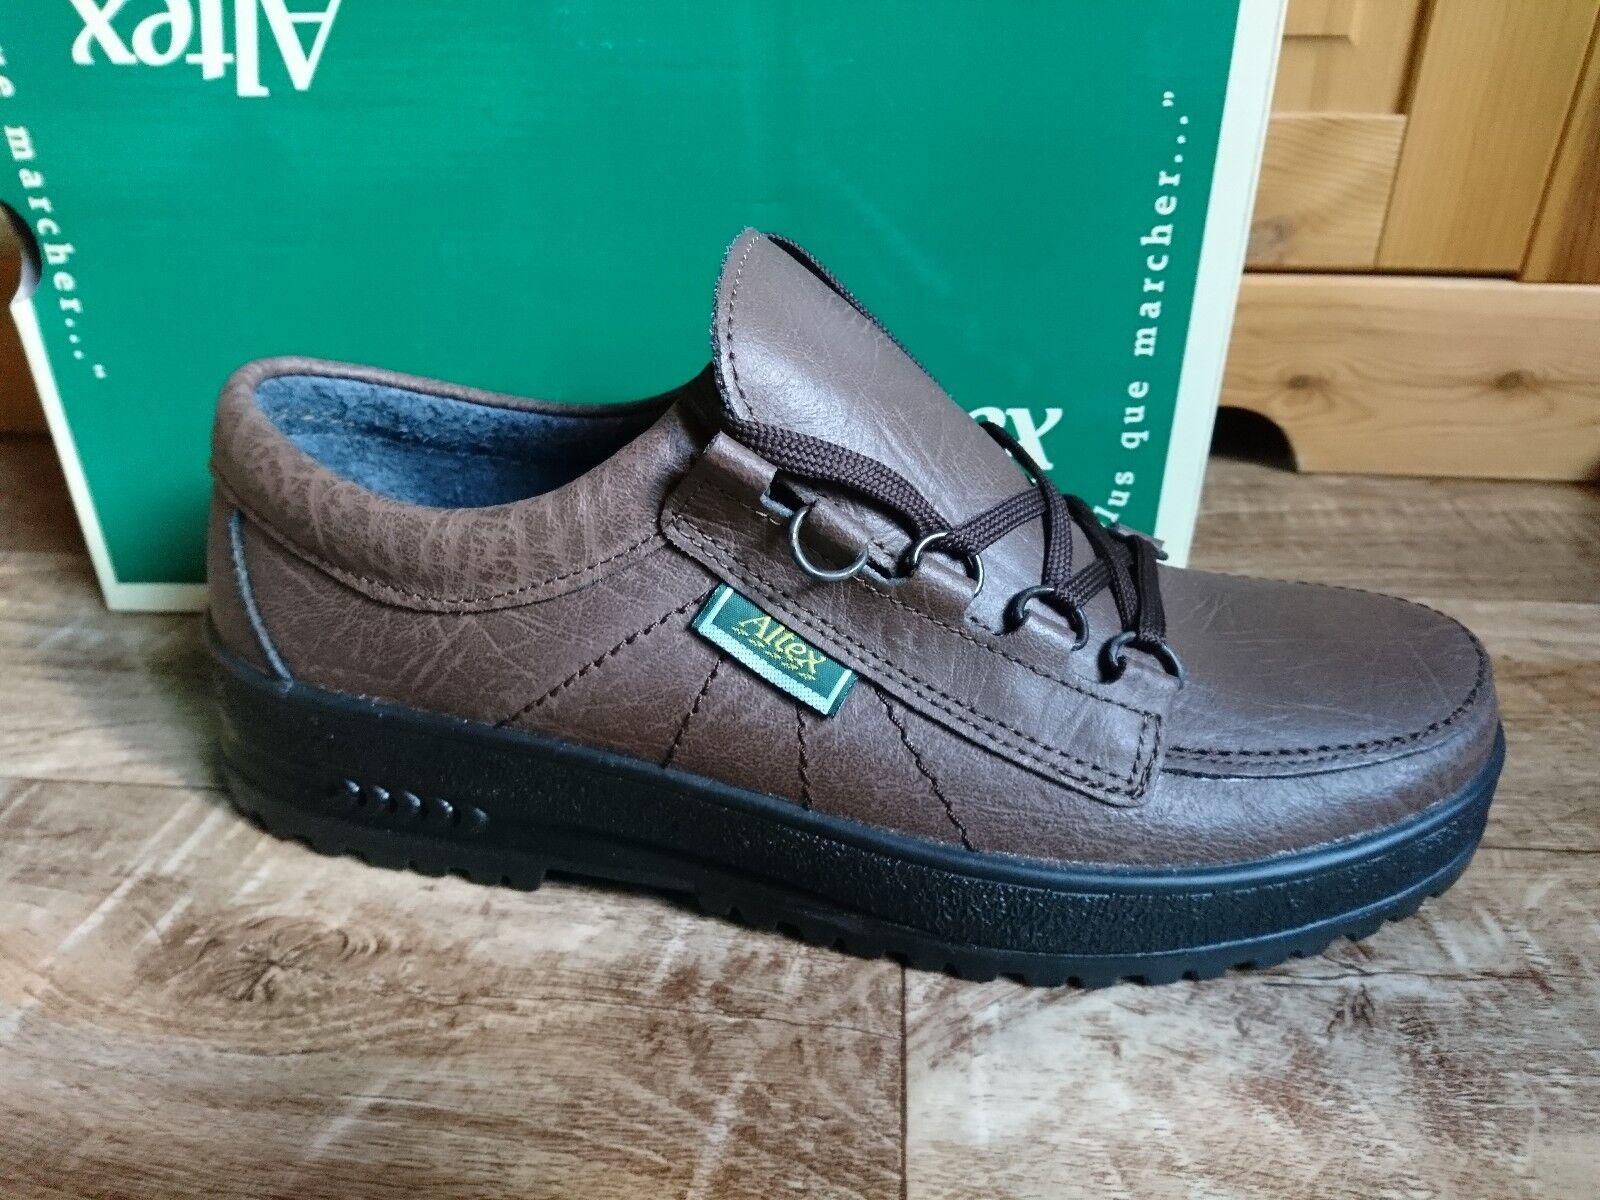 Altex Herren Schuhe Schnürhalbschuhe Leder  Braun  NEU